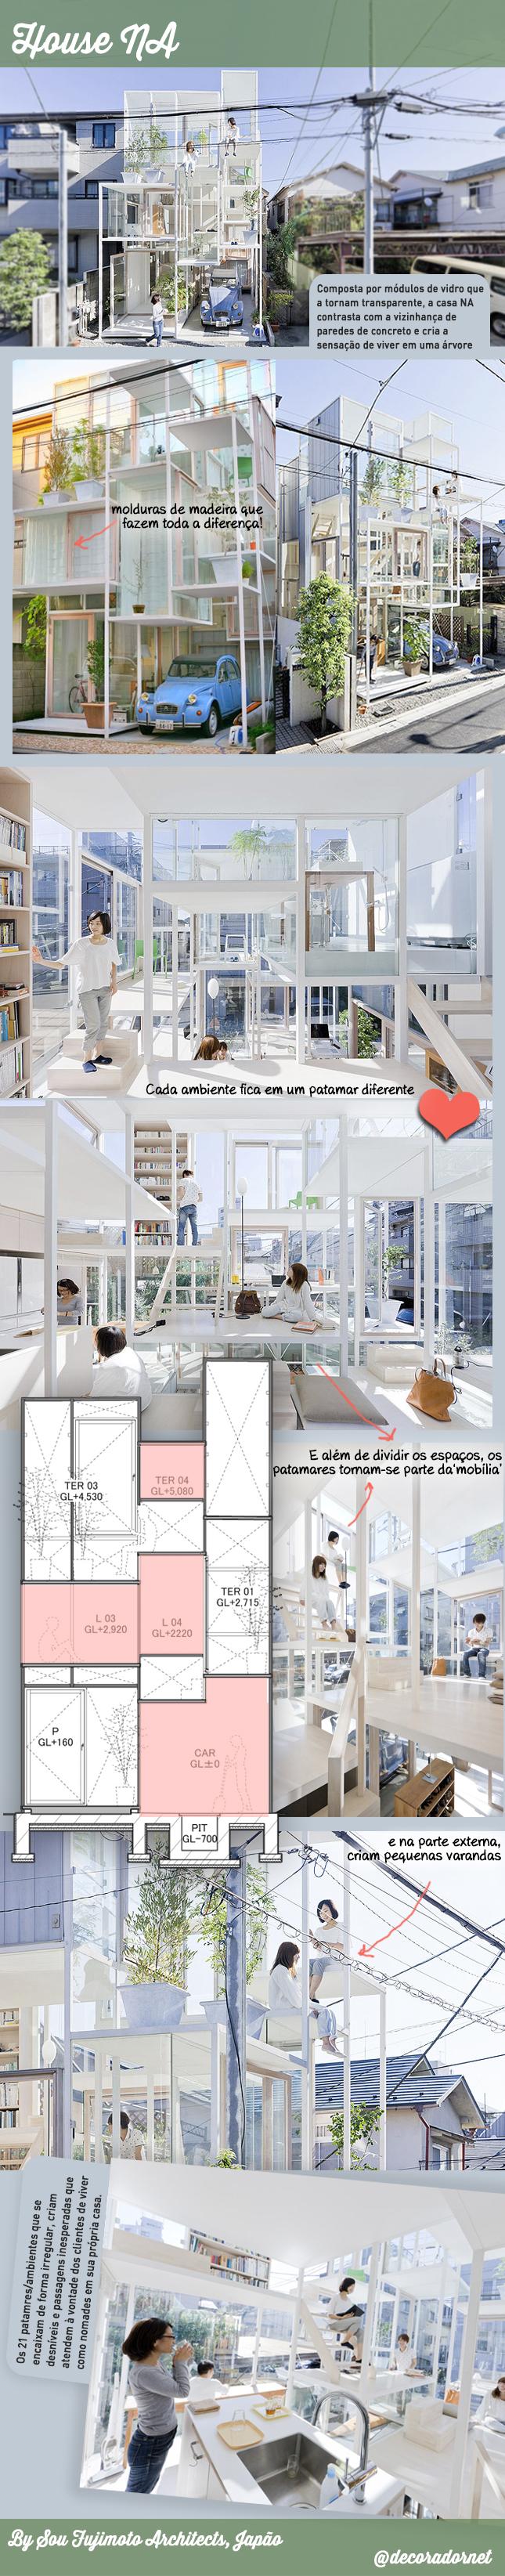 decoradornet-copyright-house-na-sou-fujimoto-10-08-16_02